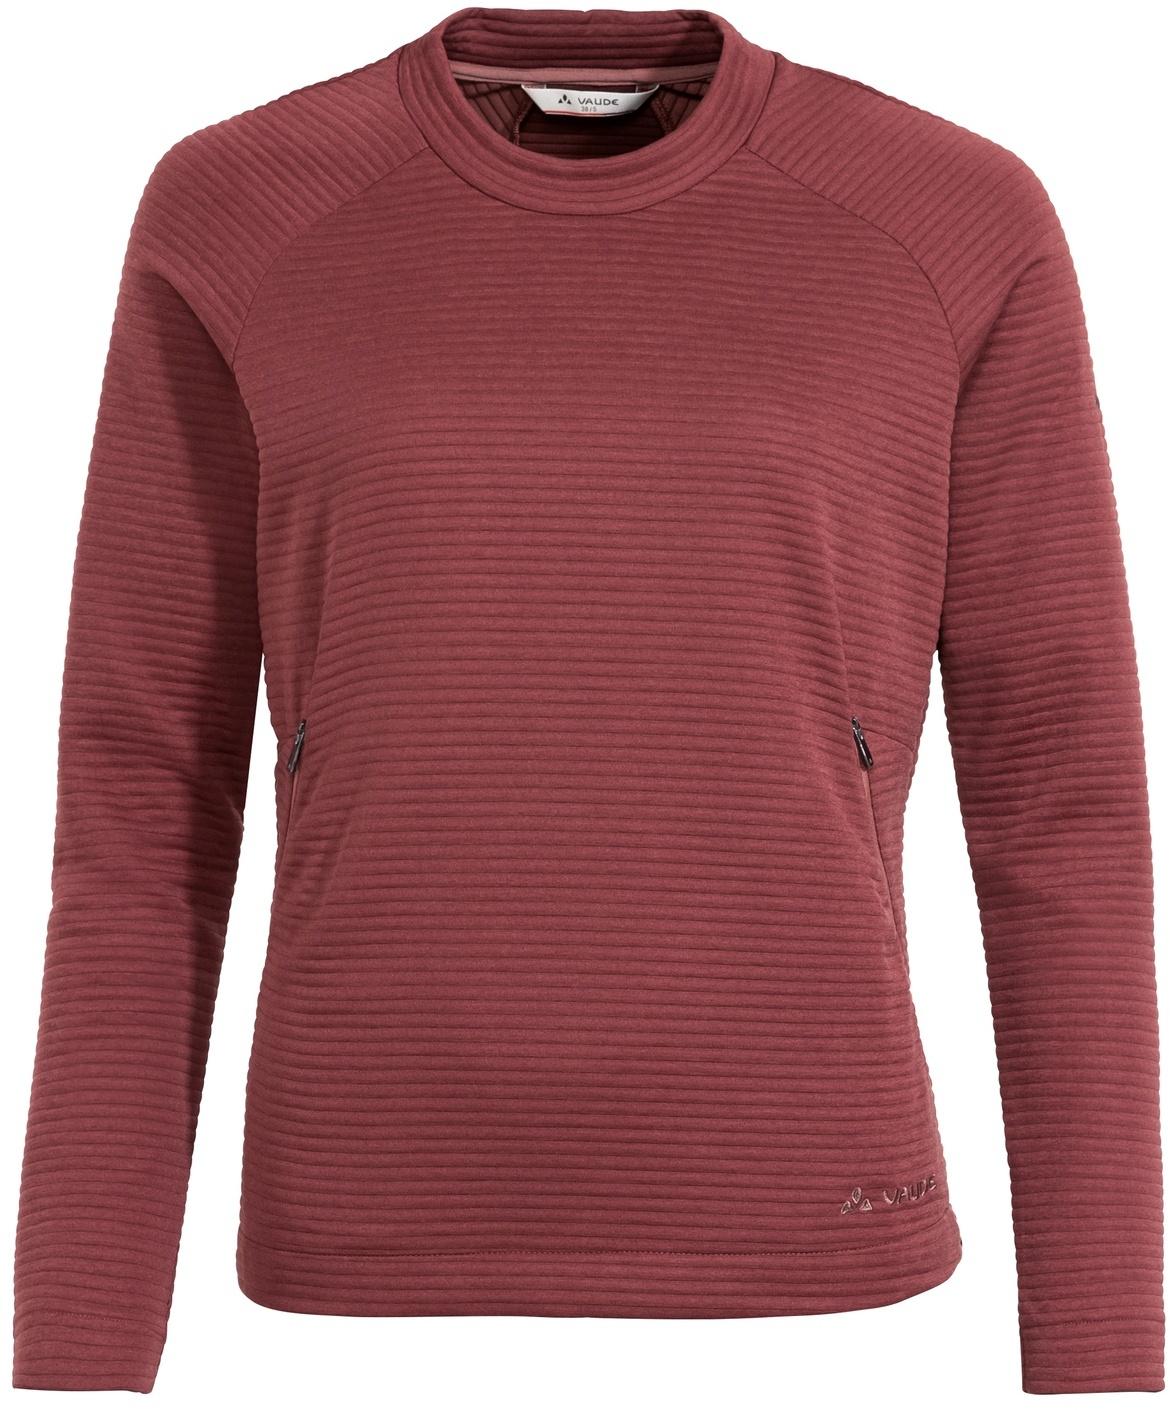 Vaude Mineo Pocket Damen Pullover - red cluster